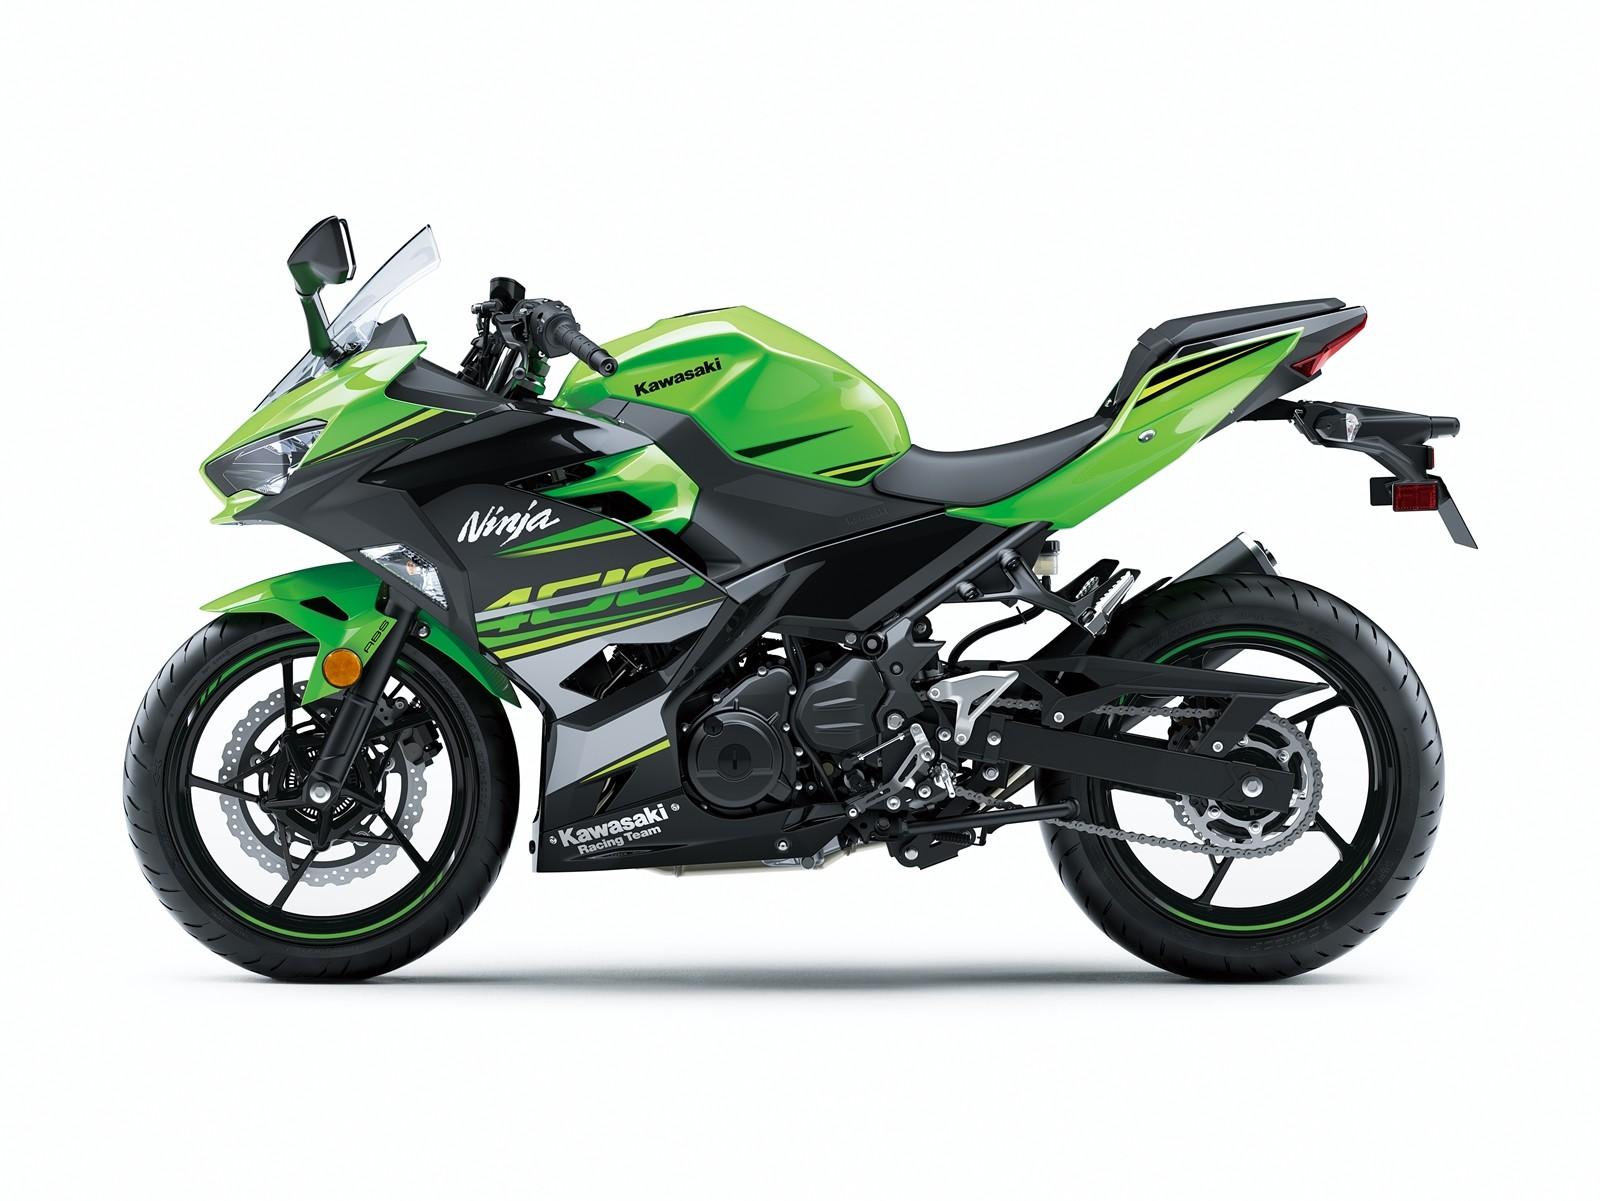 Kawasaki Ninja 400 2018